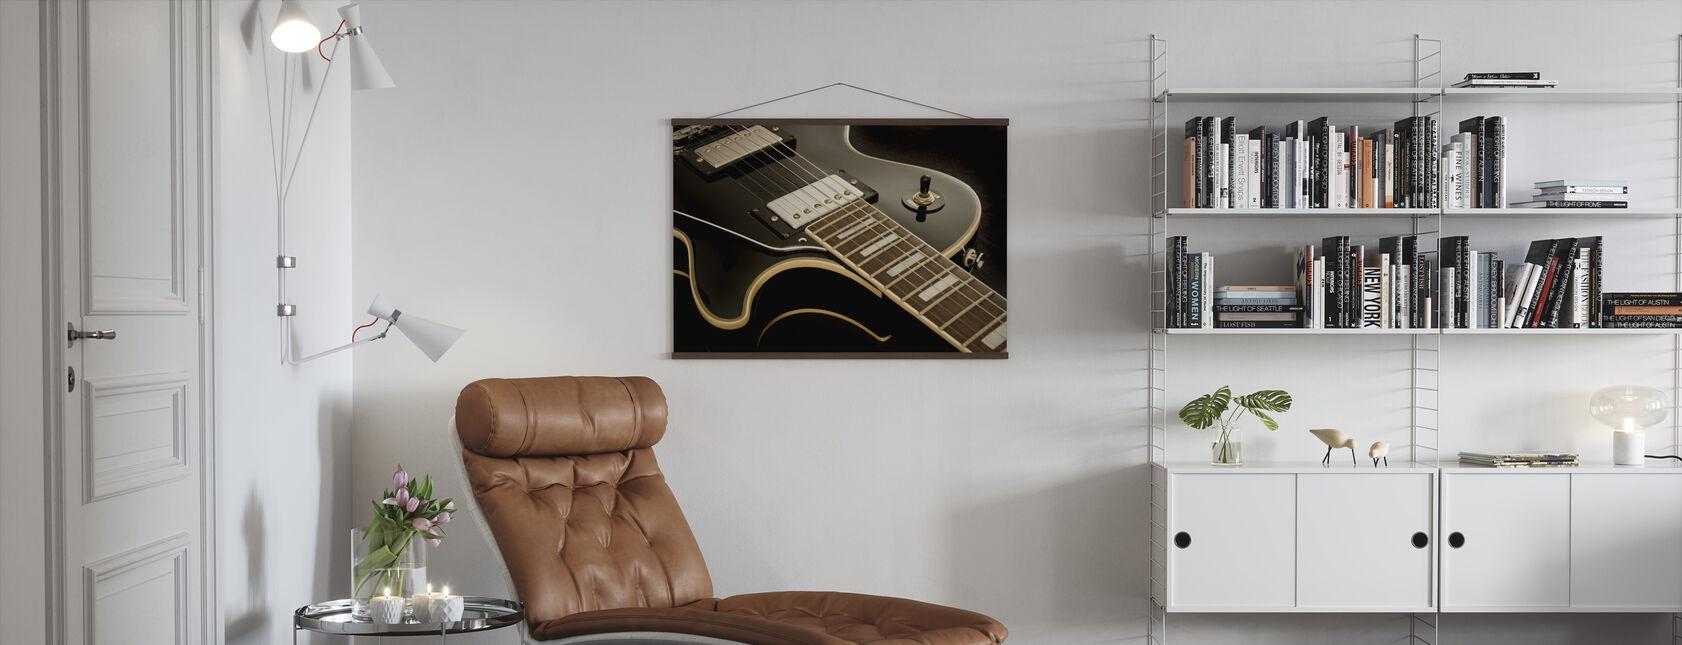 Vintage Gitar - Plakat - Stue